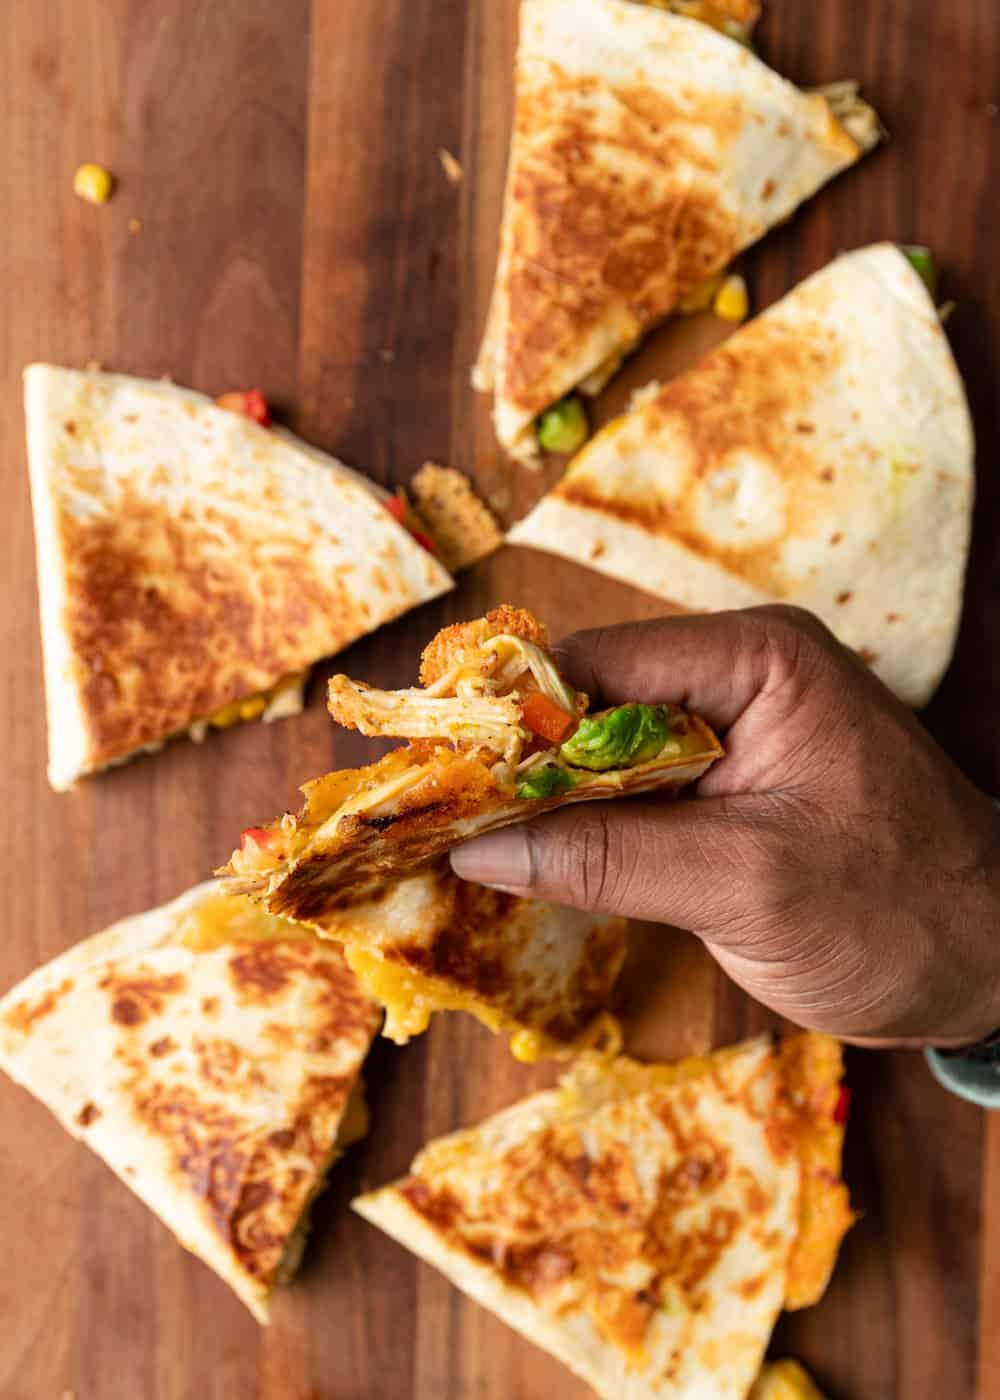 man's hand holding a quesadilla slice